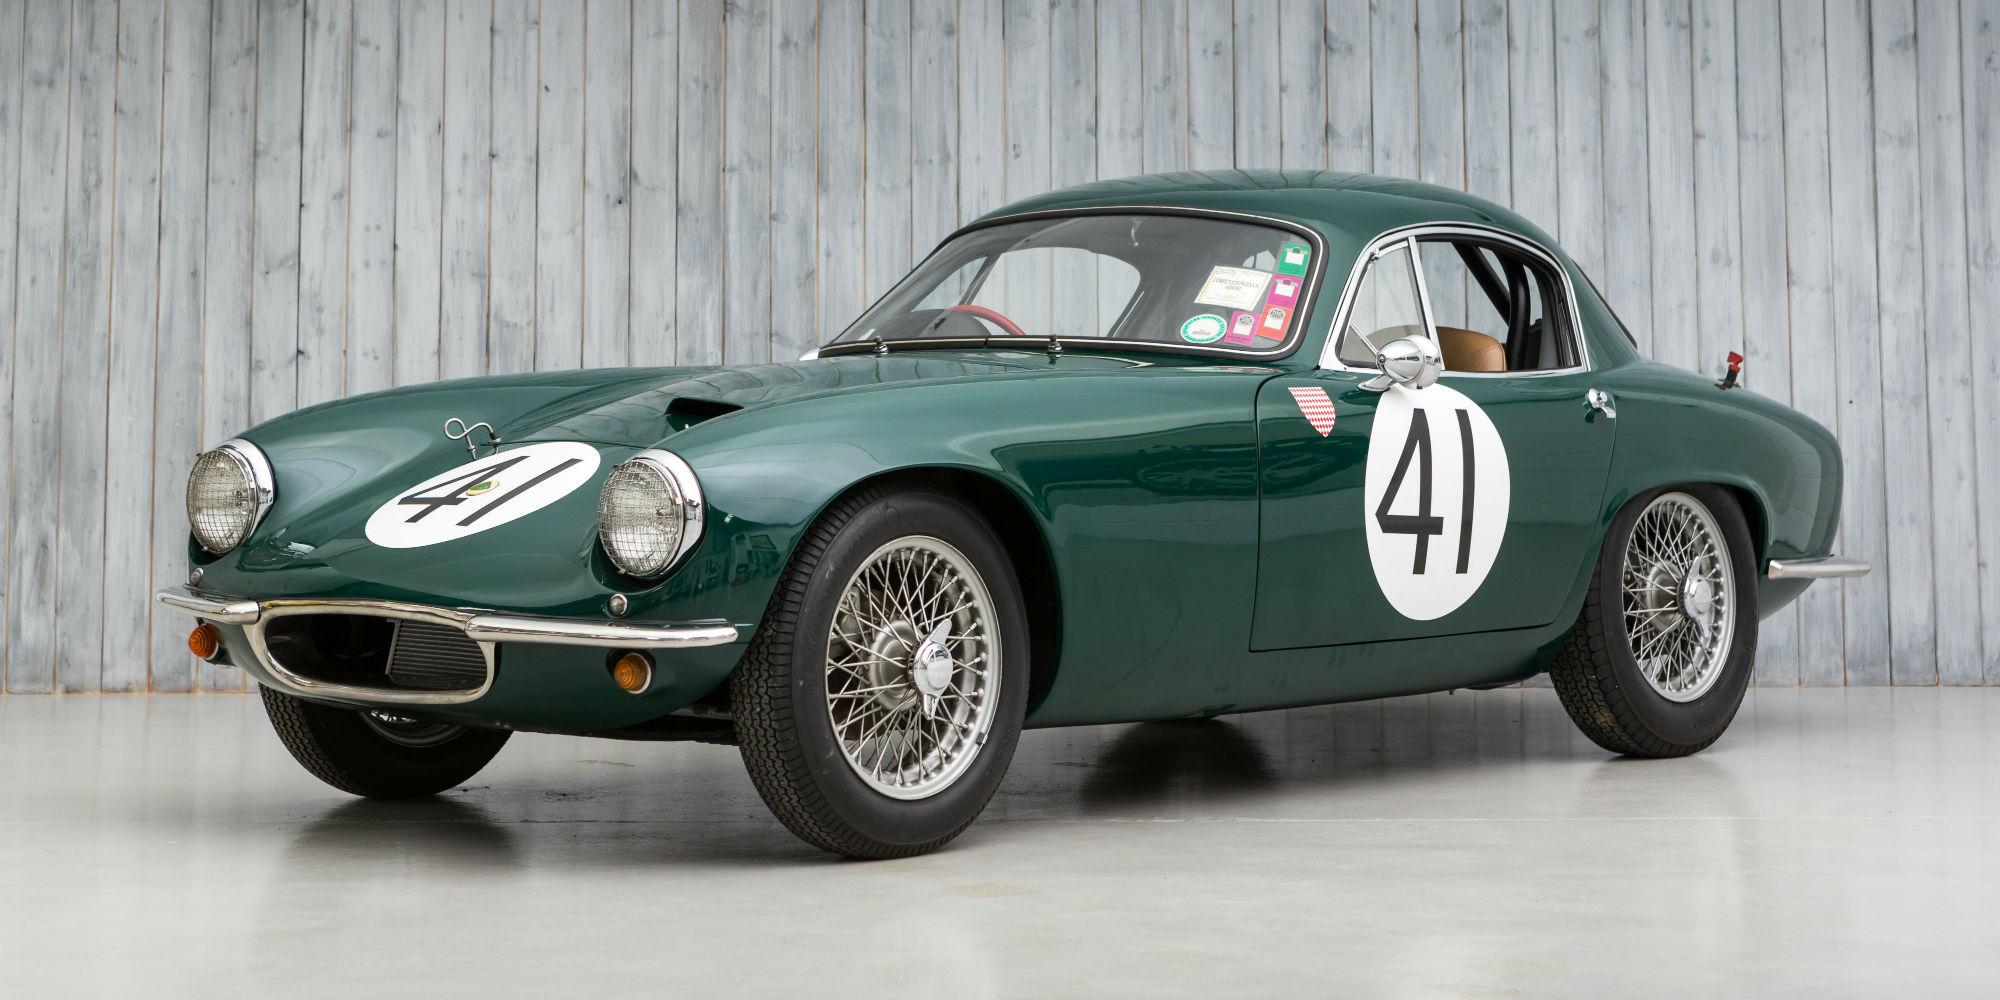 1959 Lotus Elite Series 1